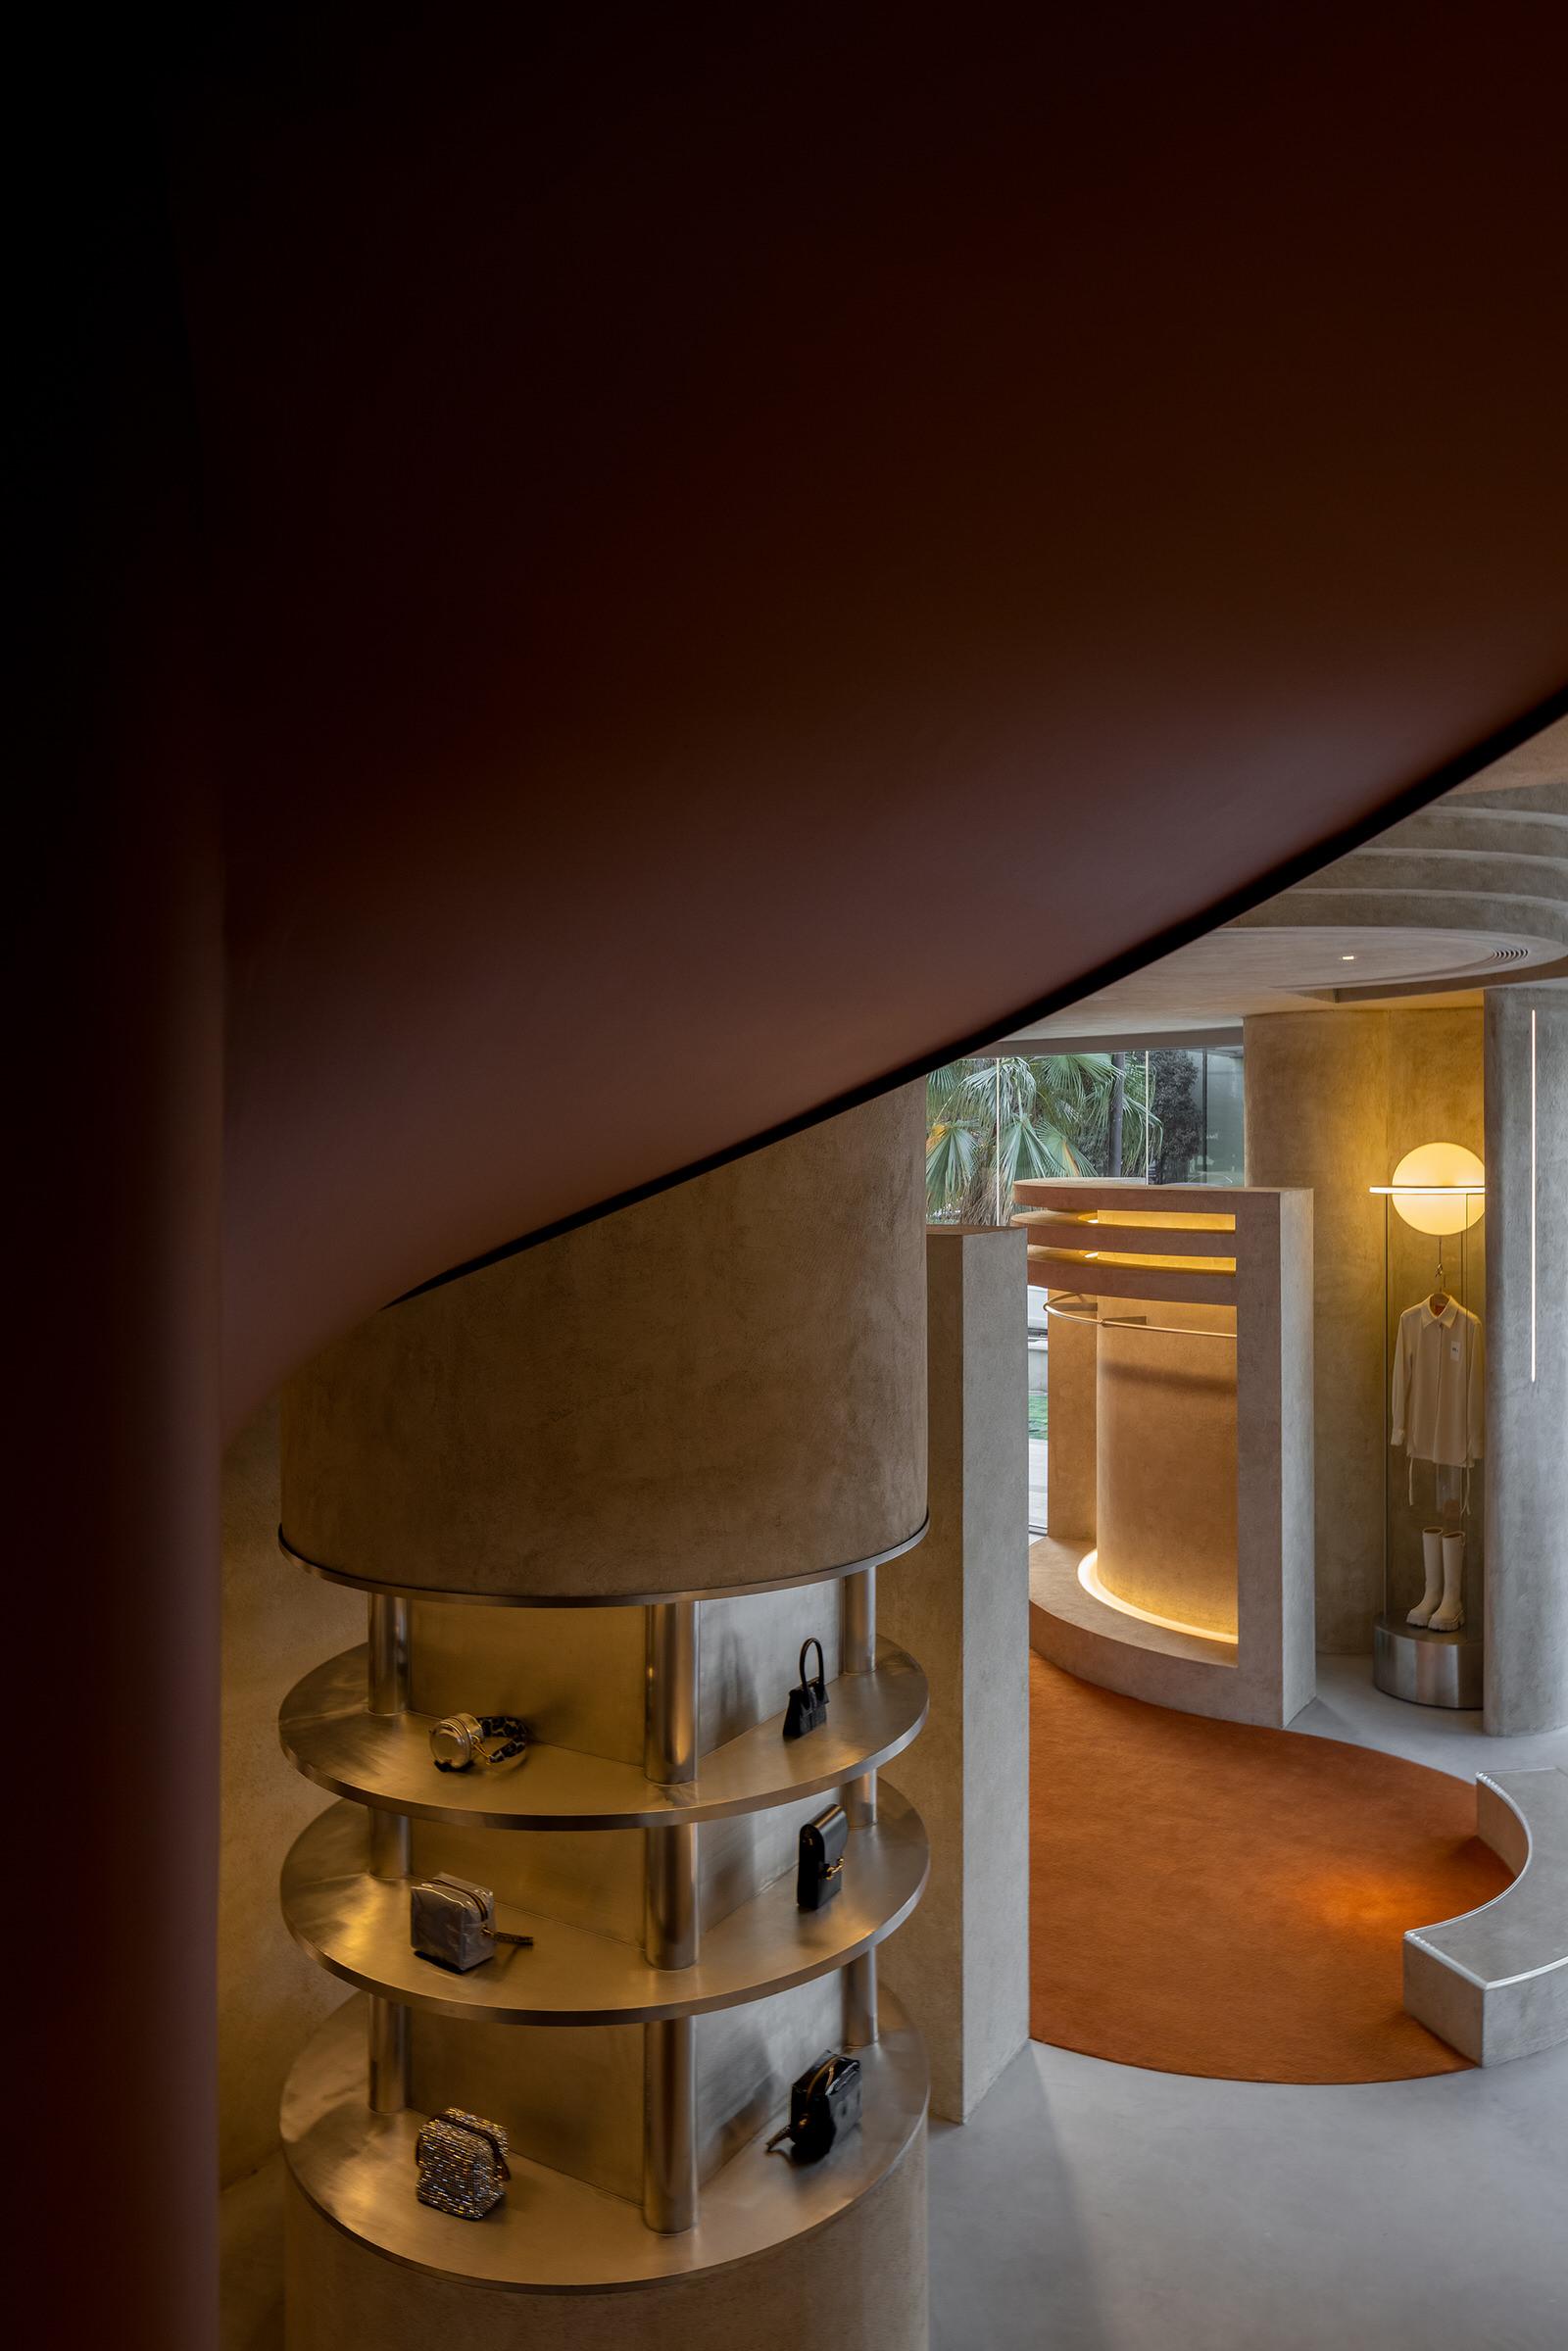 Liang Architecture Studio Audrey Boutique Hangzhou China Luxury Retail Photo Shao Feng Yellowtrace 03